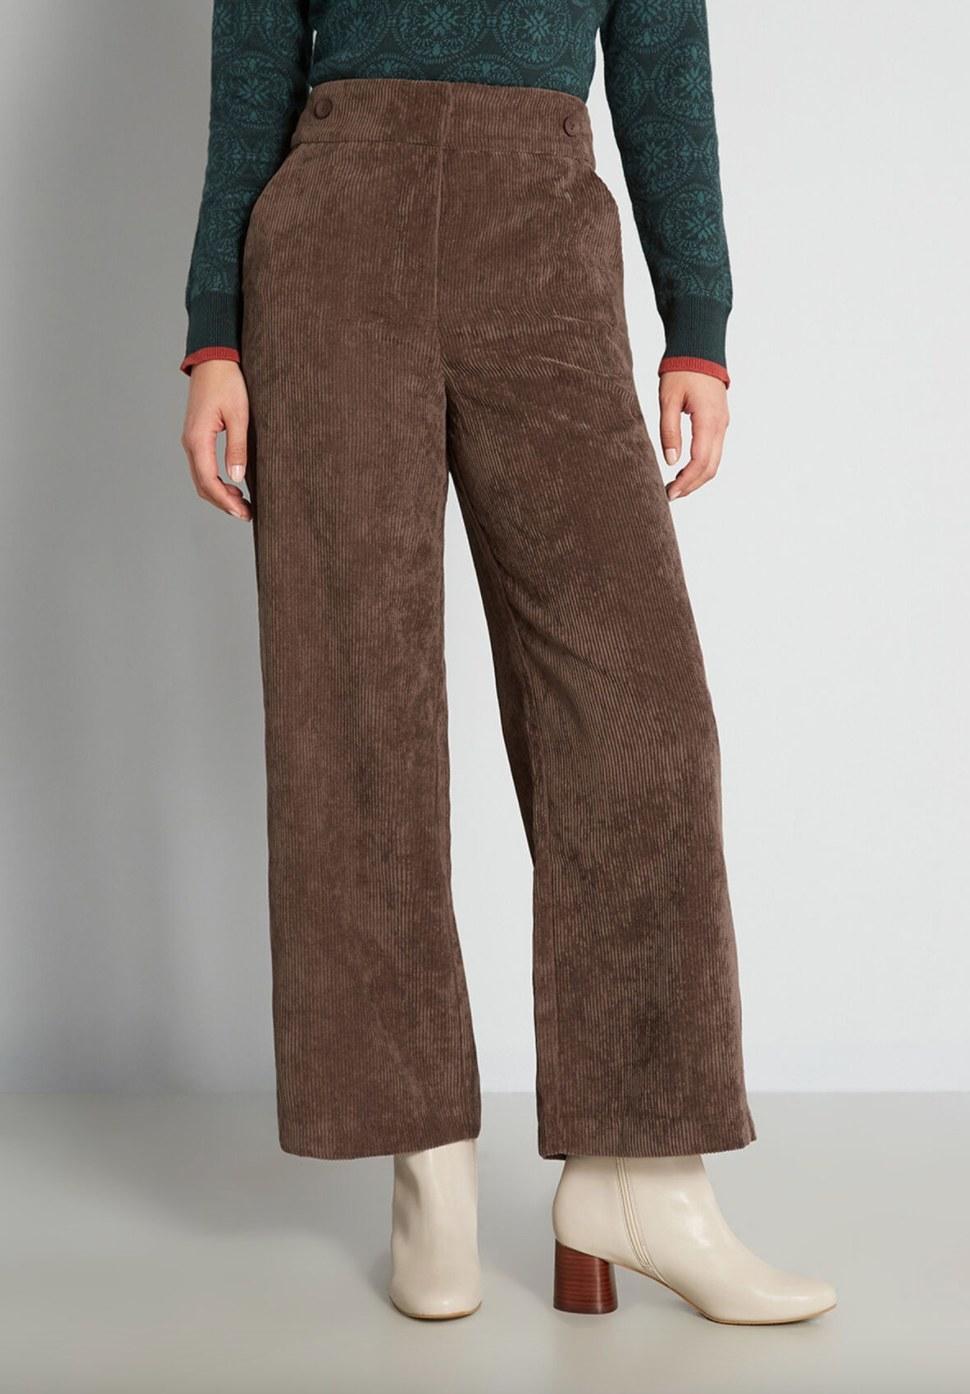 model wearing the brown pants